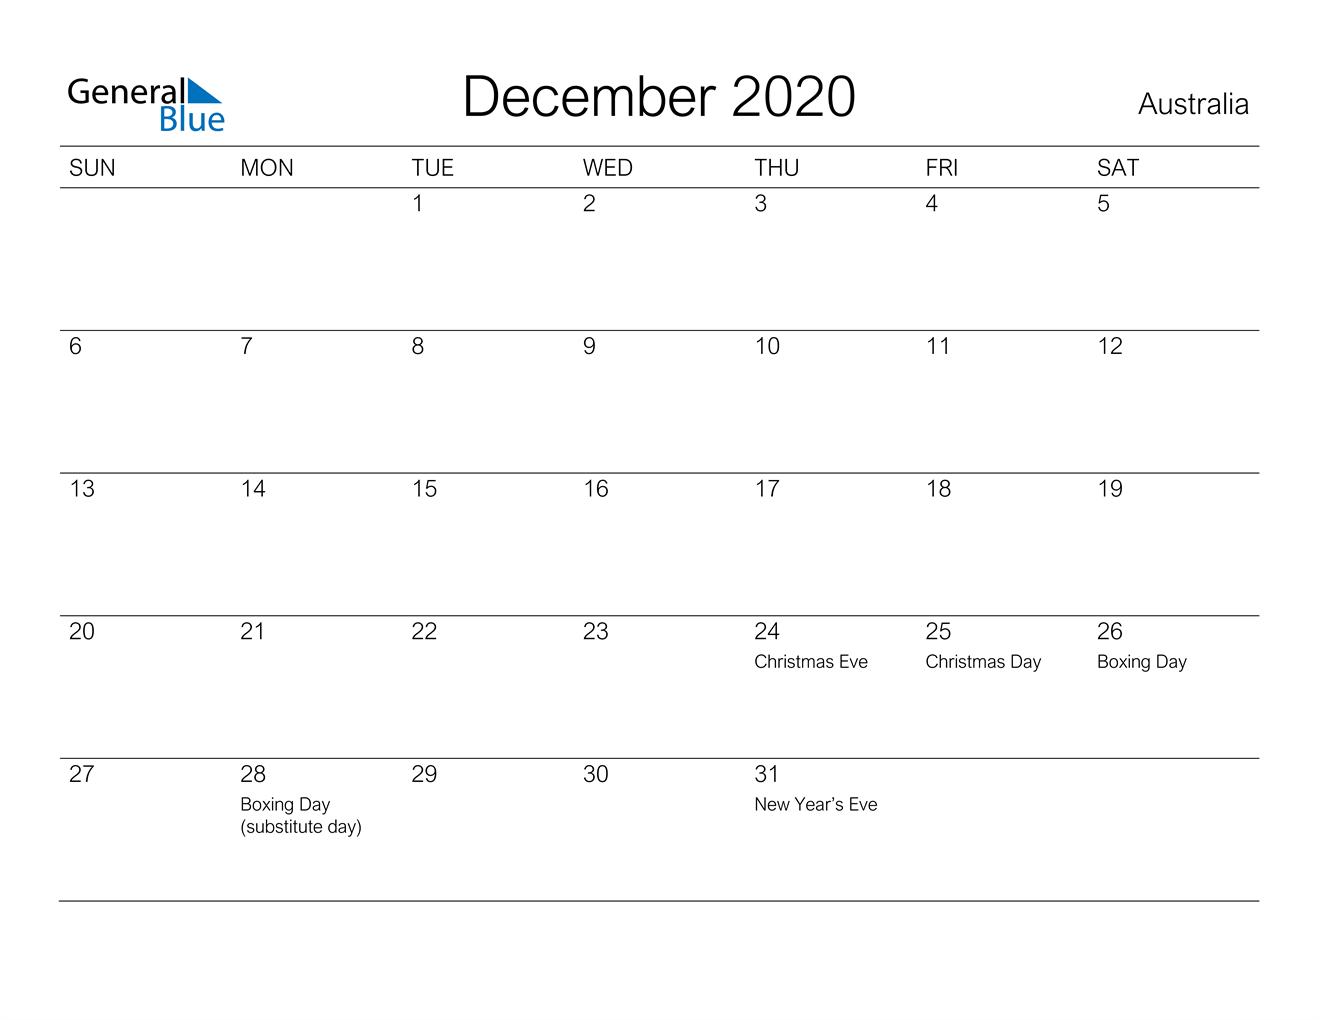 December 2020 Calendar Australia